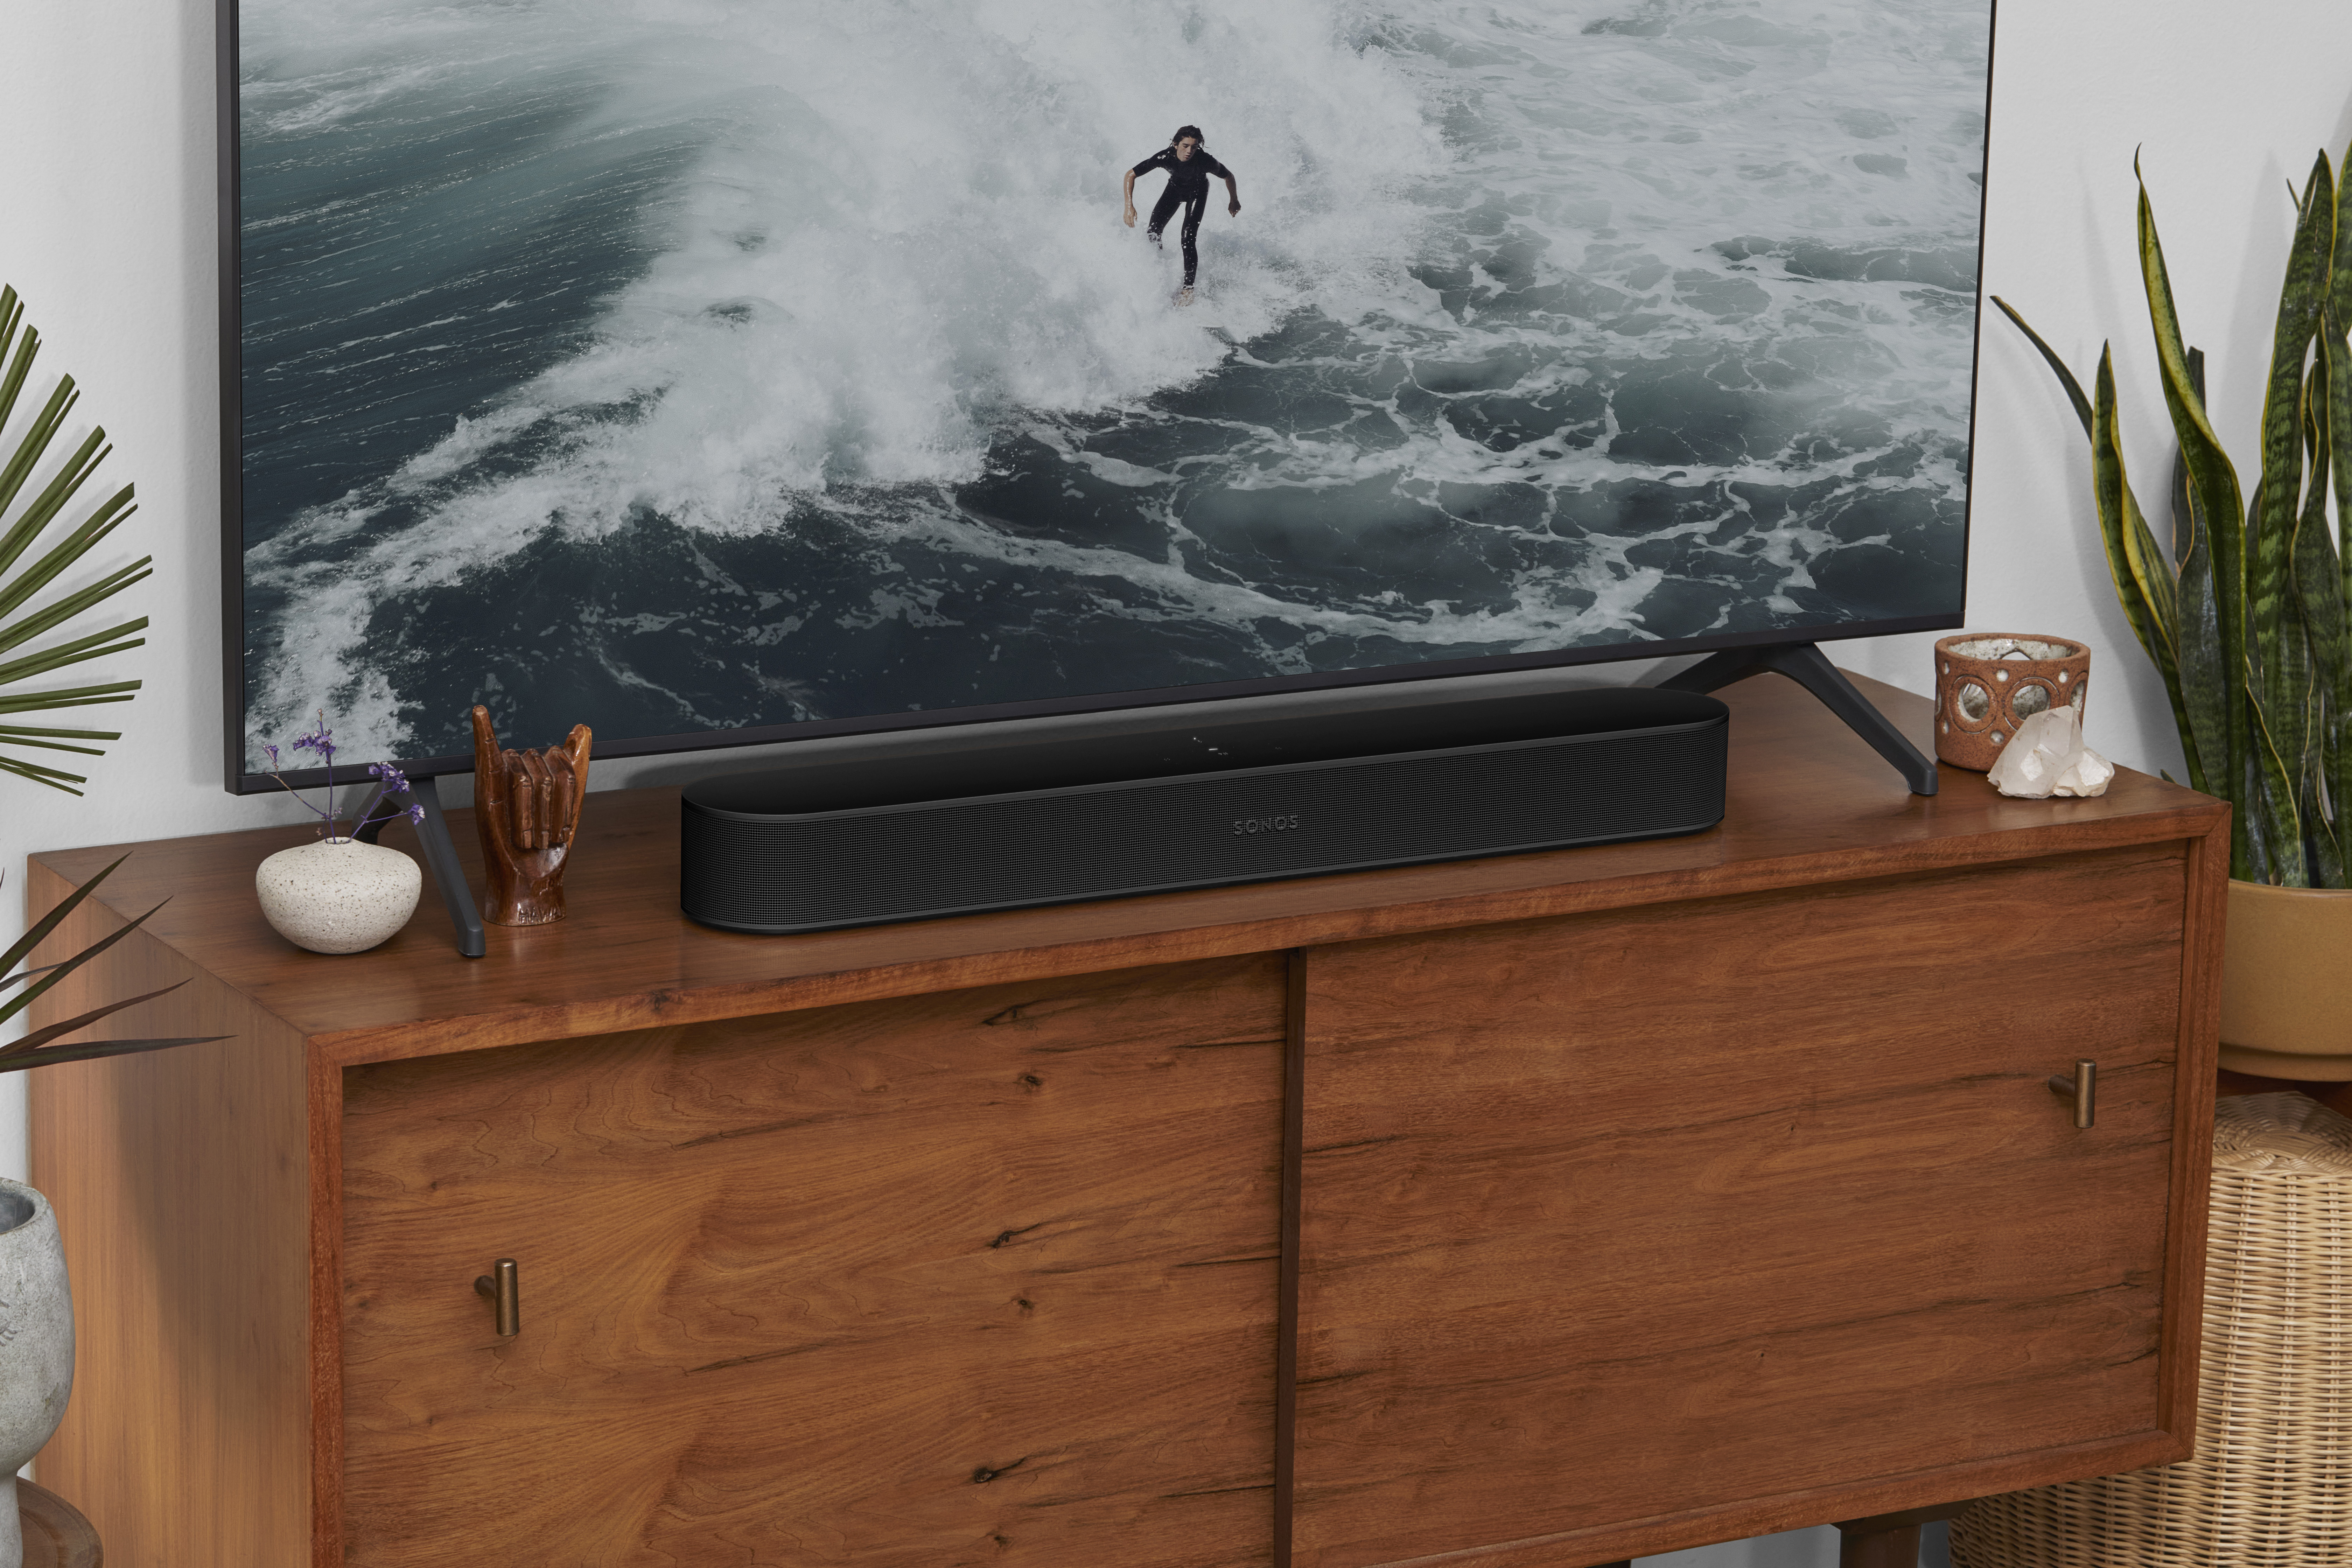 Beam - TV Surfing